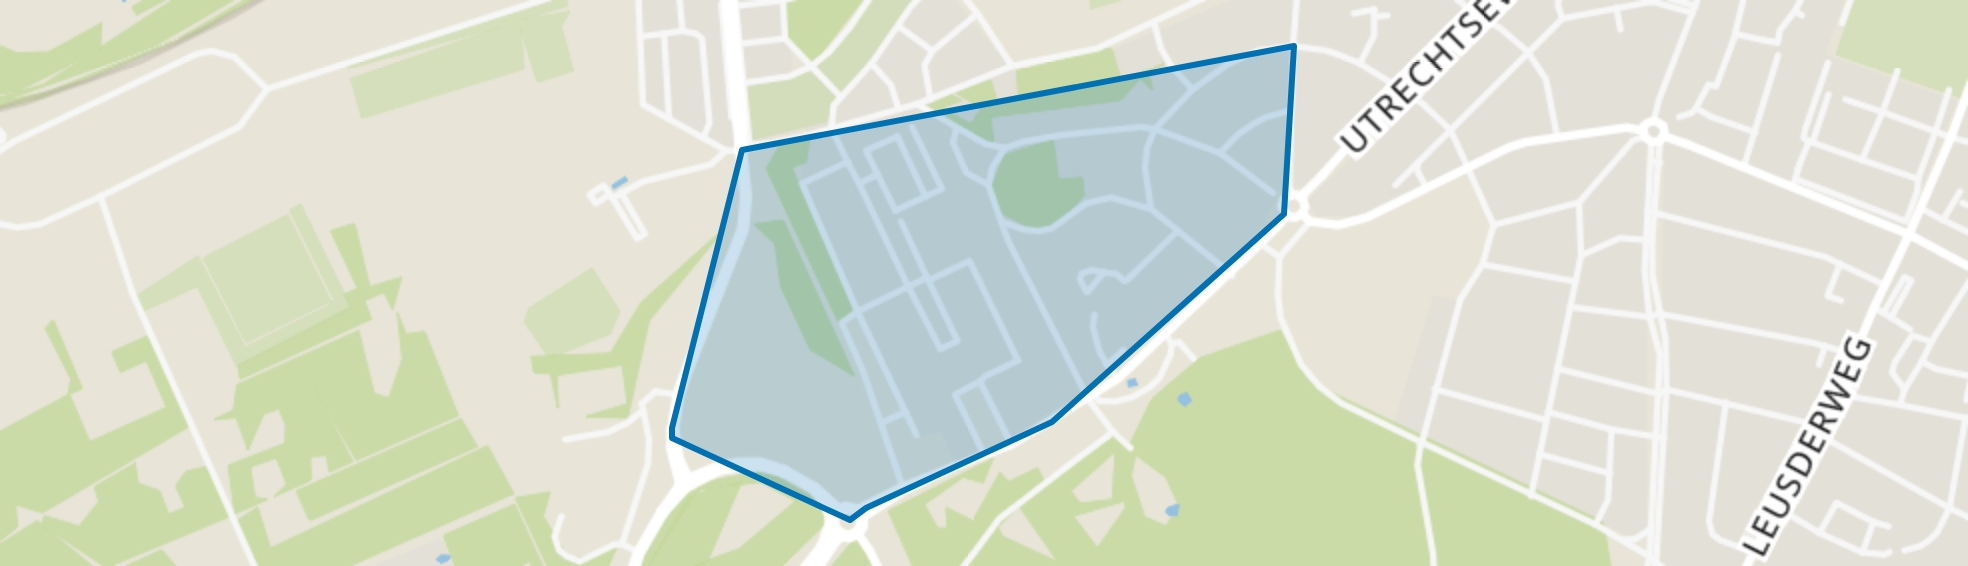 Oranjelaan, Amersfoort map